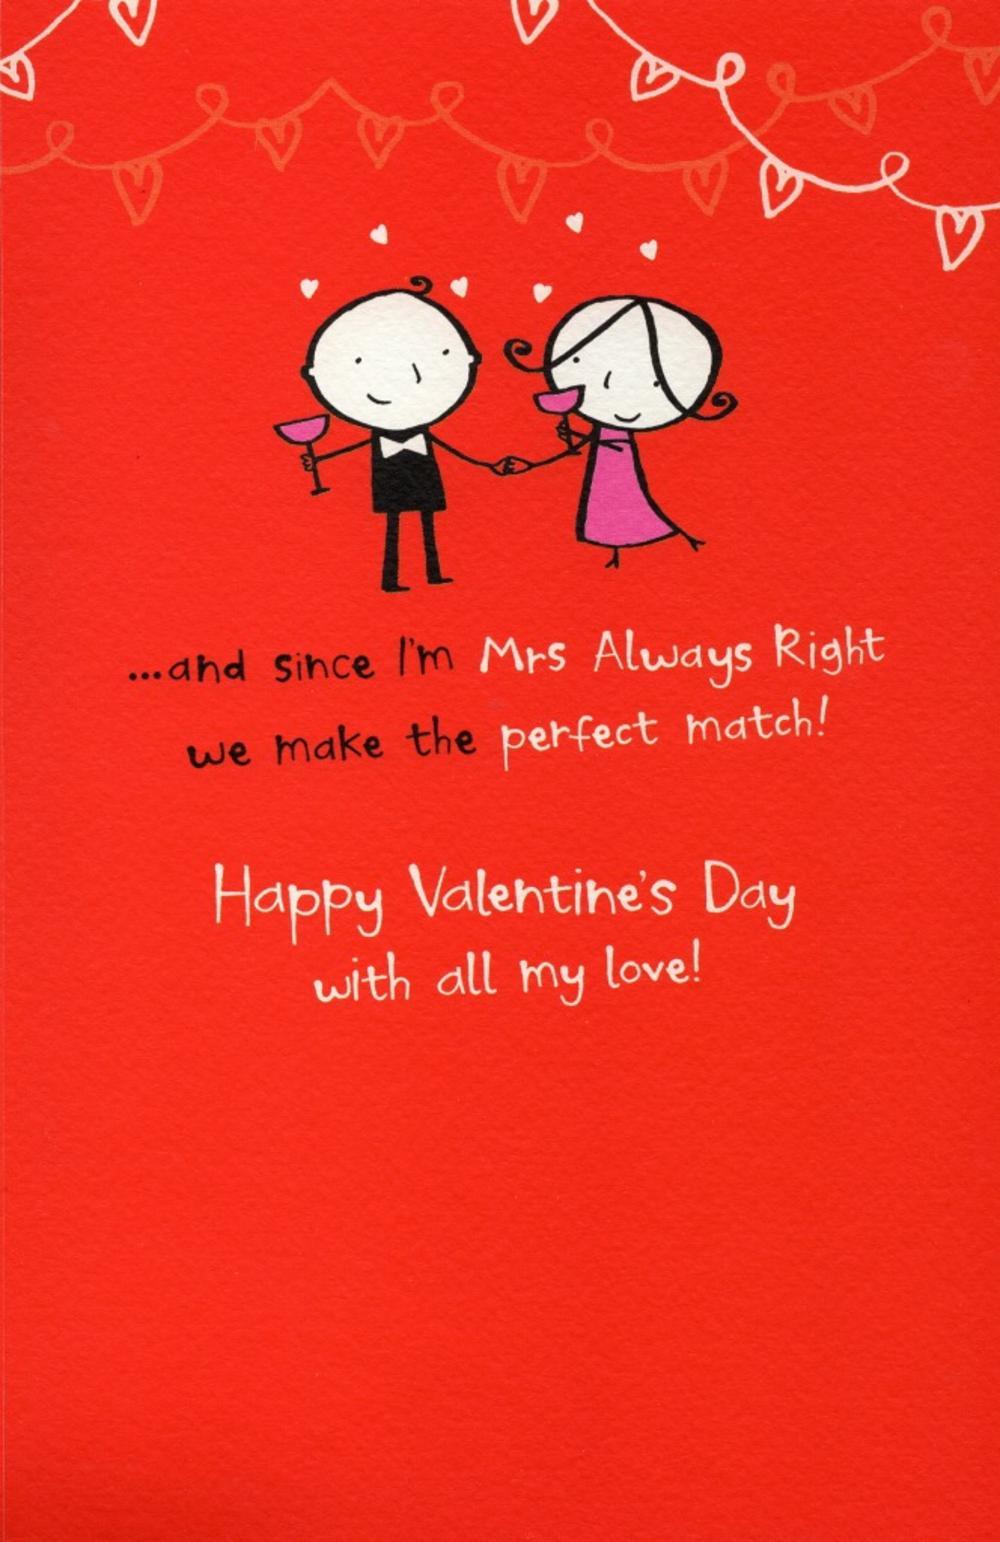 thumbnail 2 - Husband Valentines Day